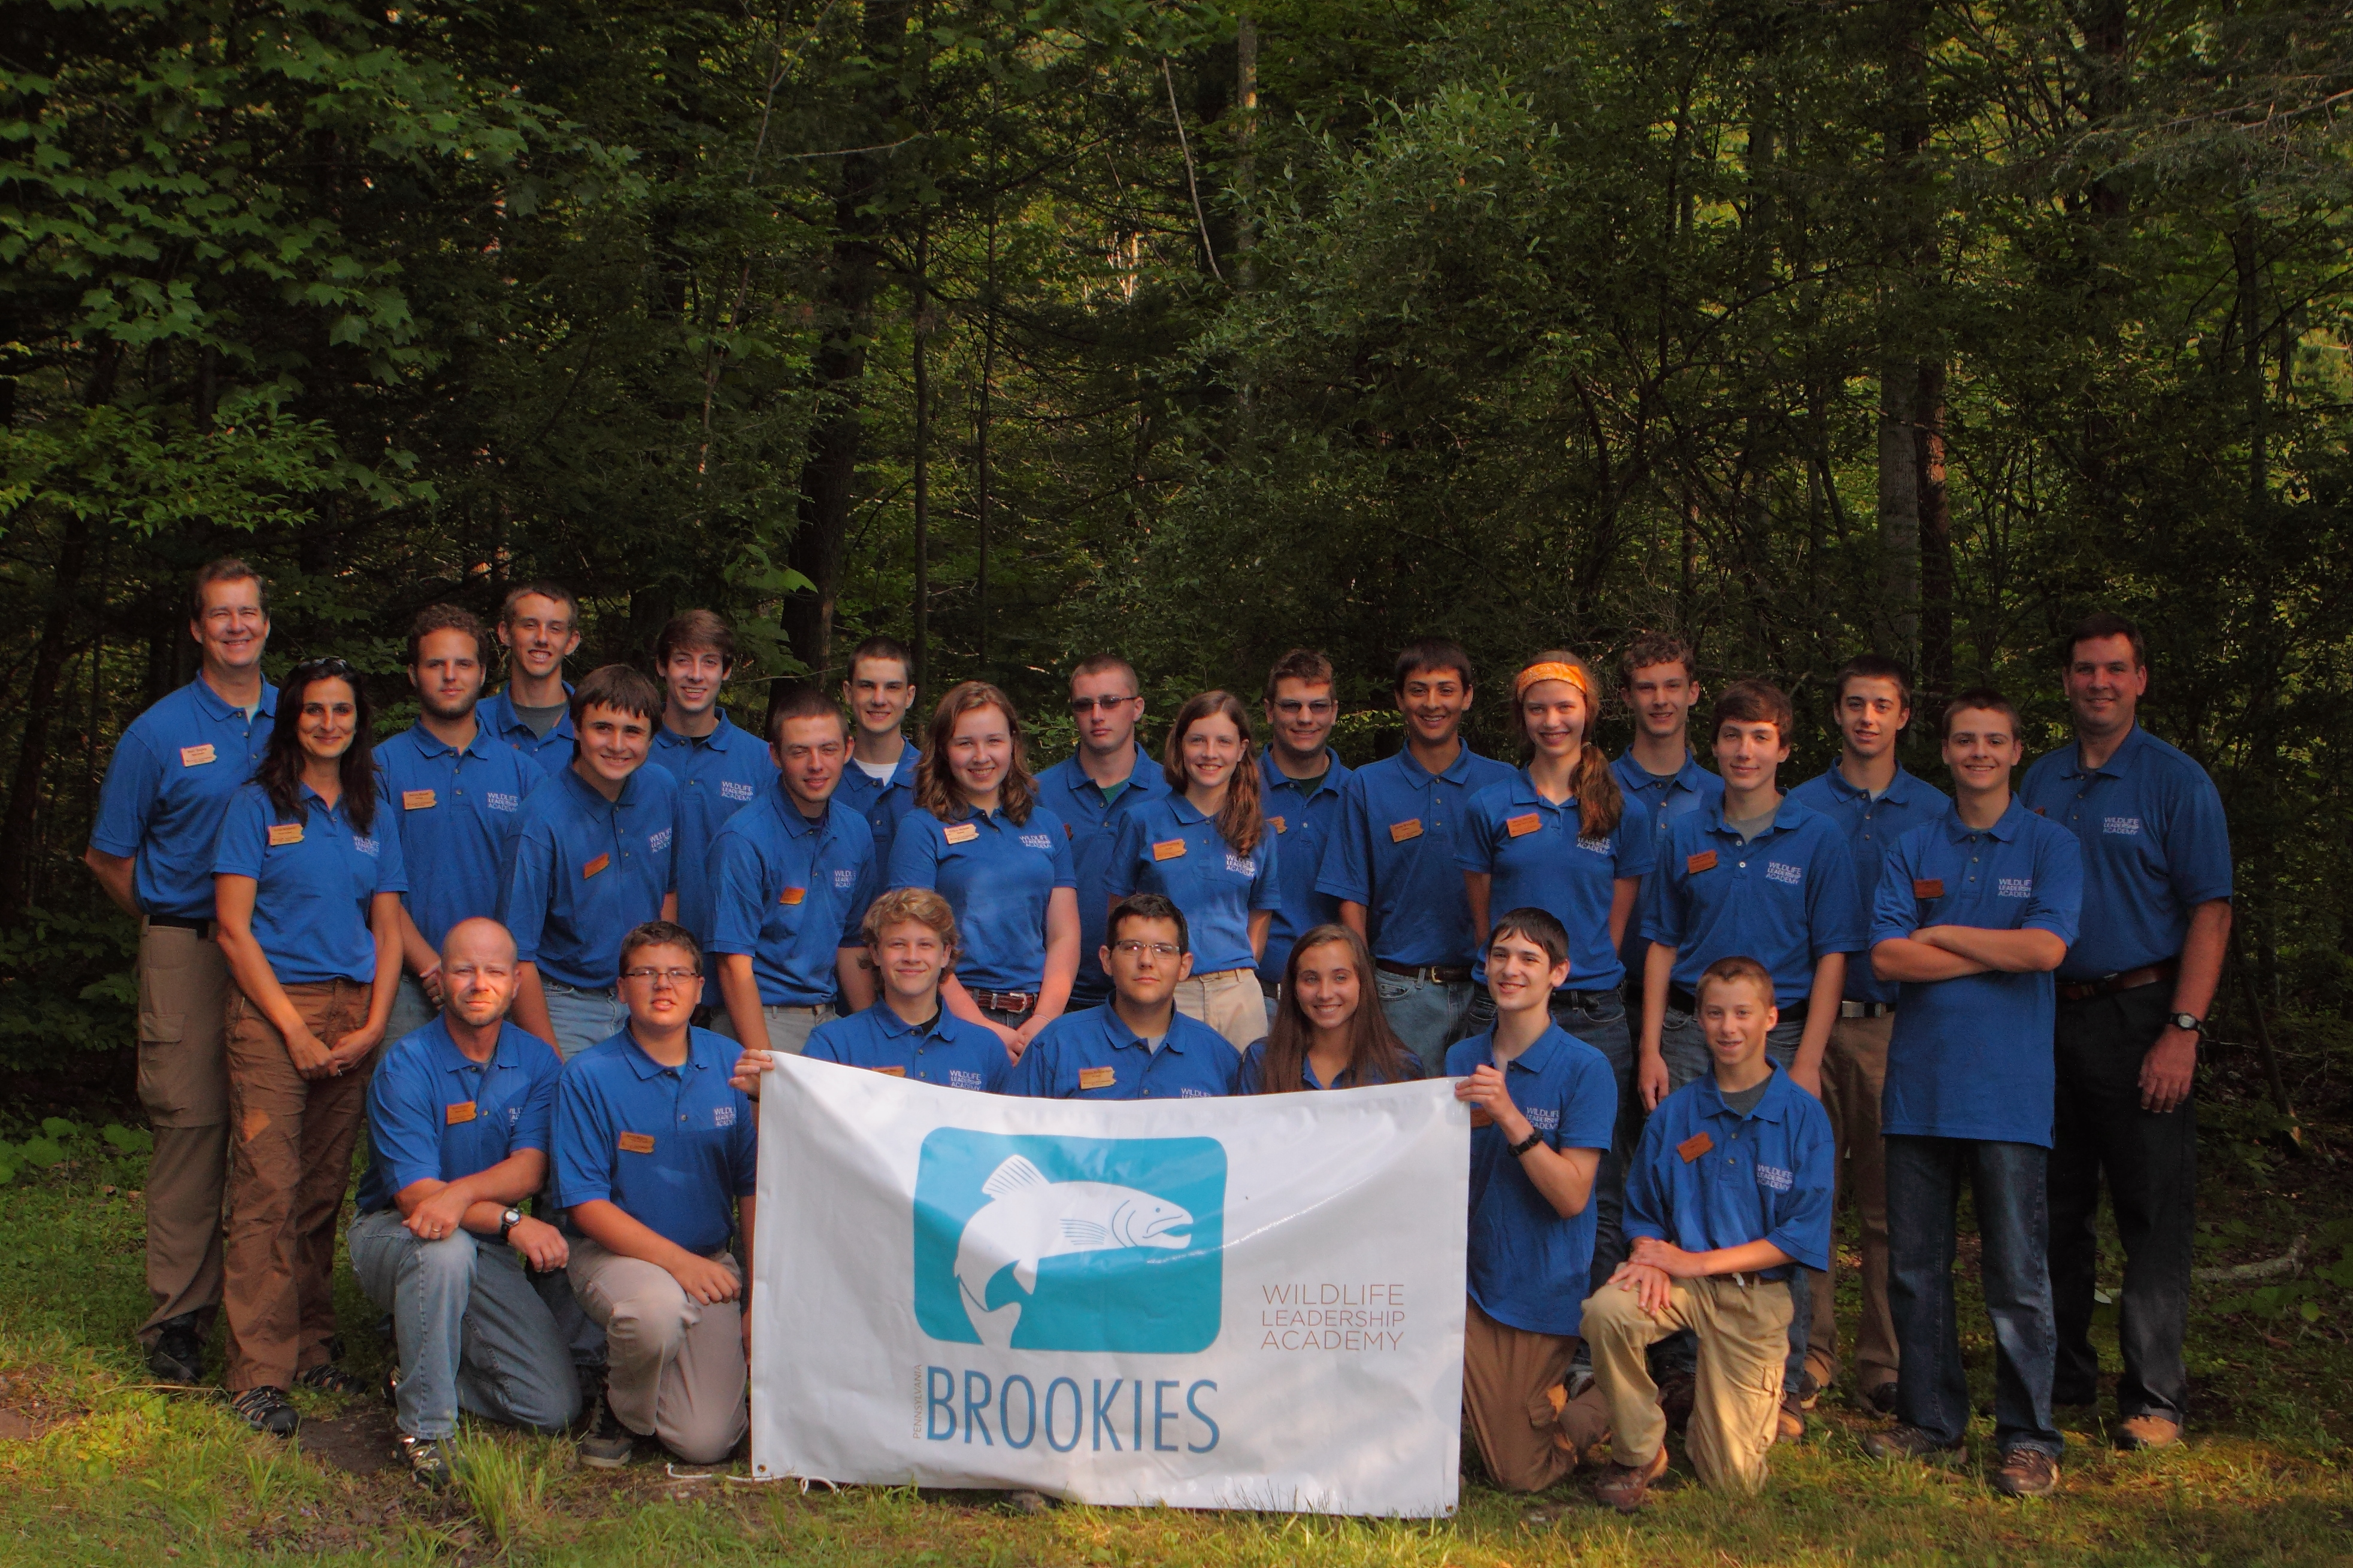 Brookies Class of 2014